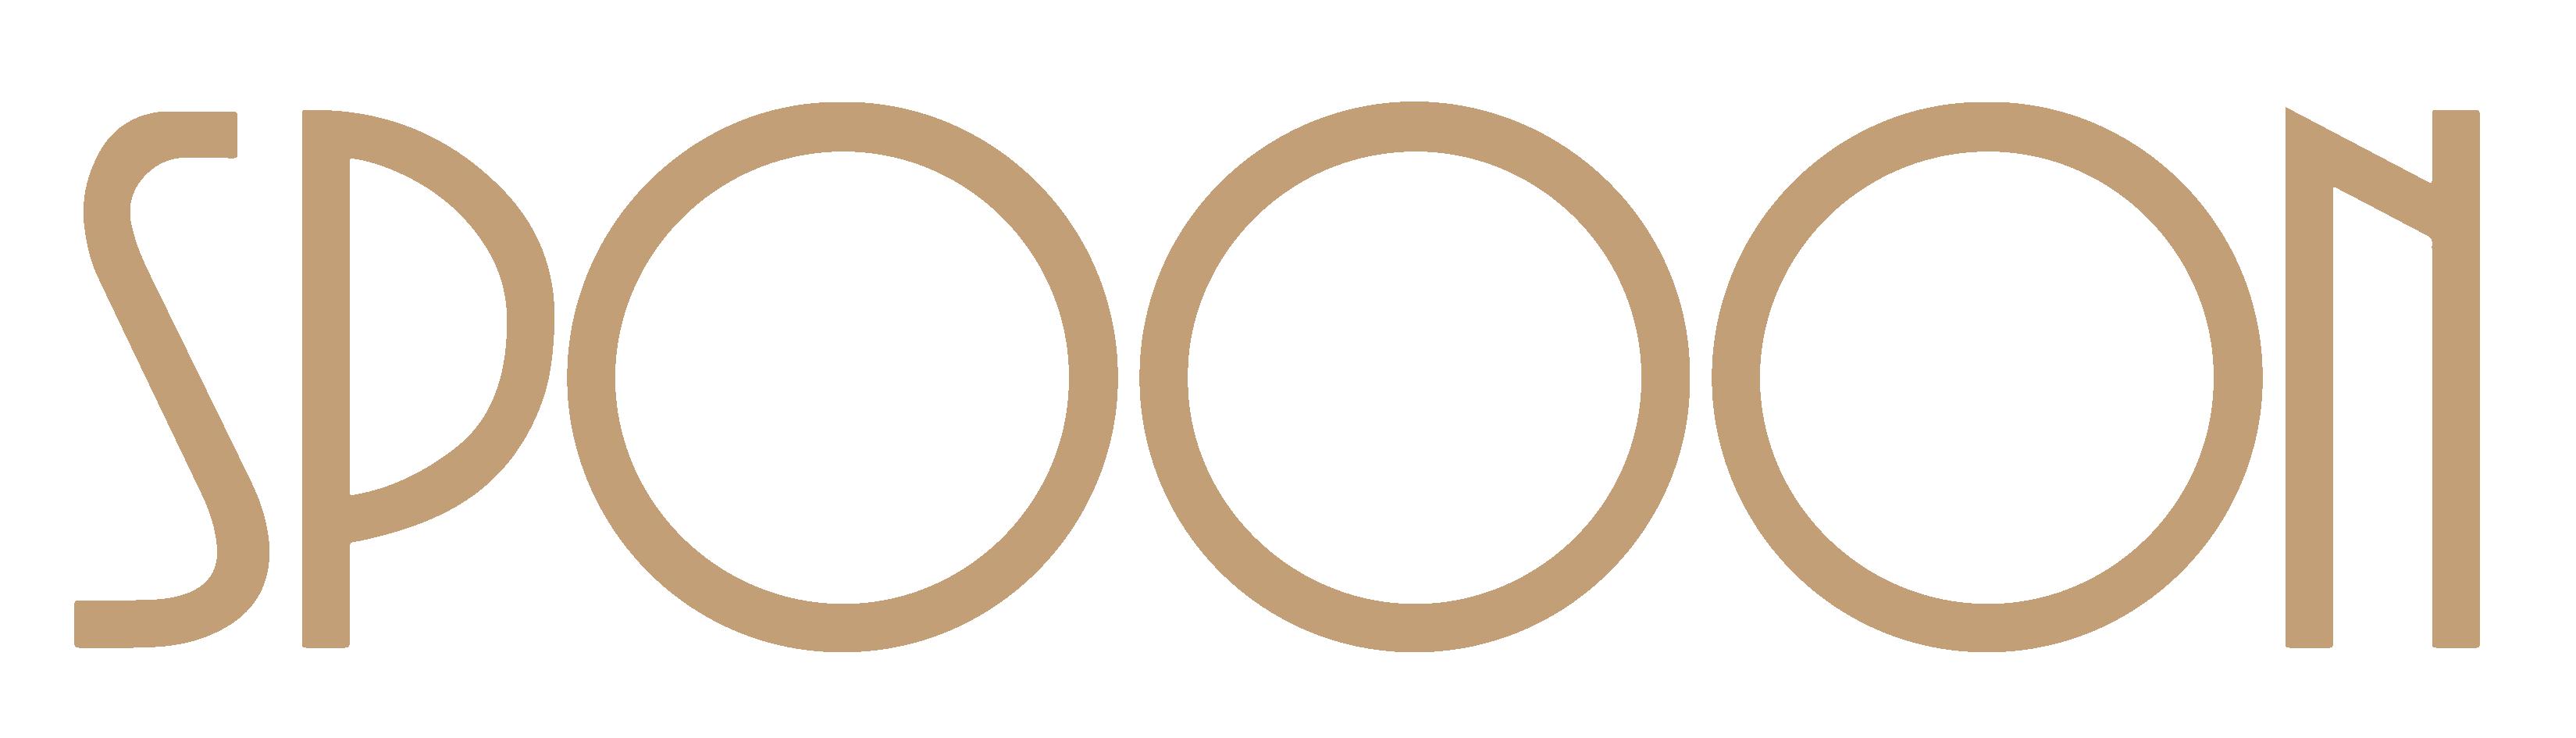 mobile logo spooon